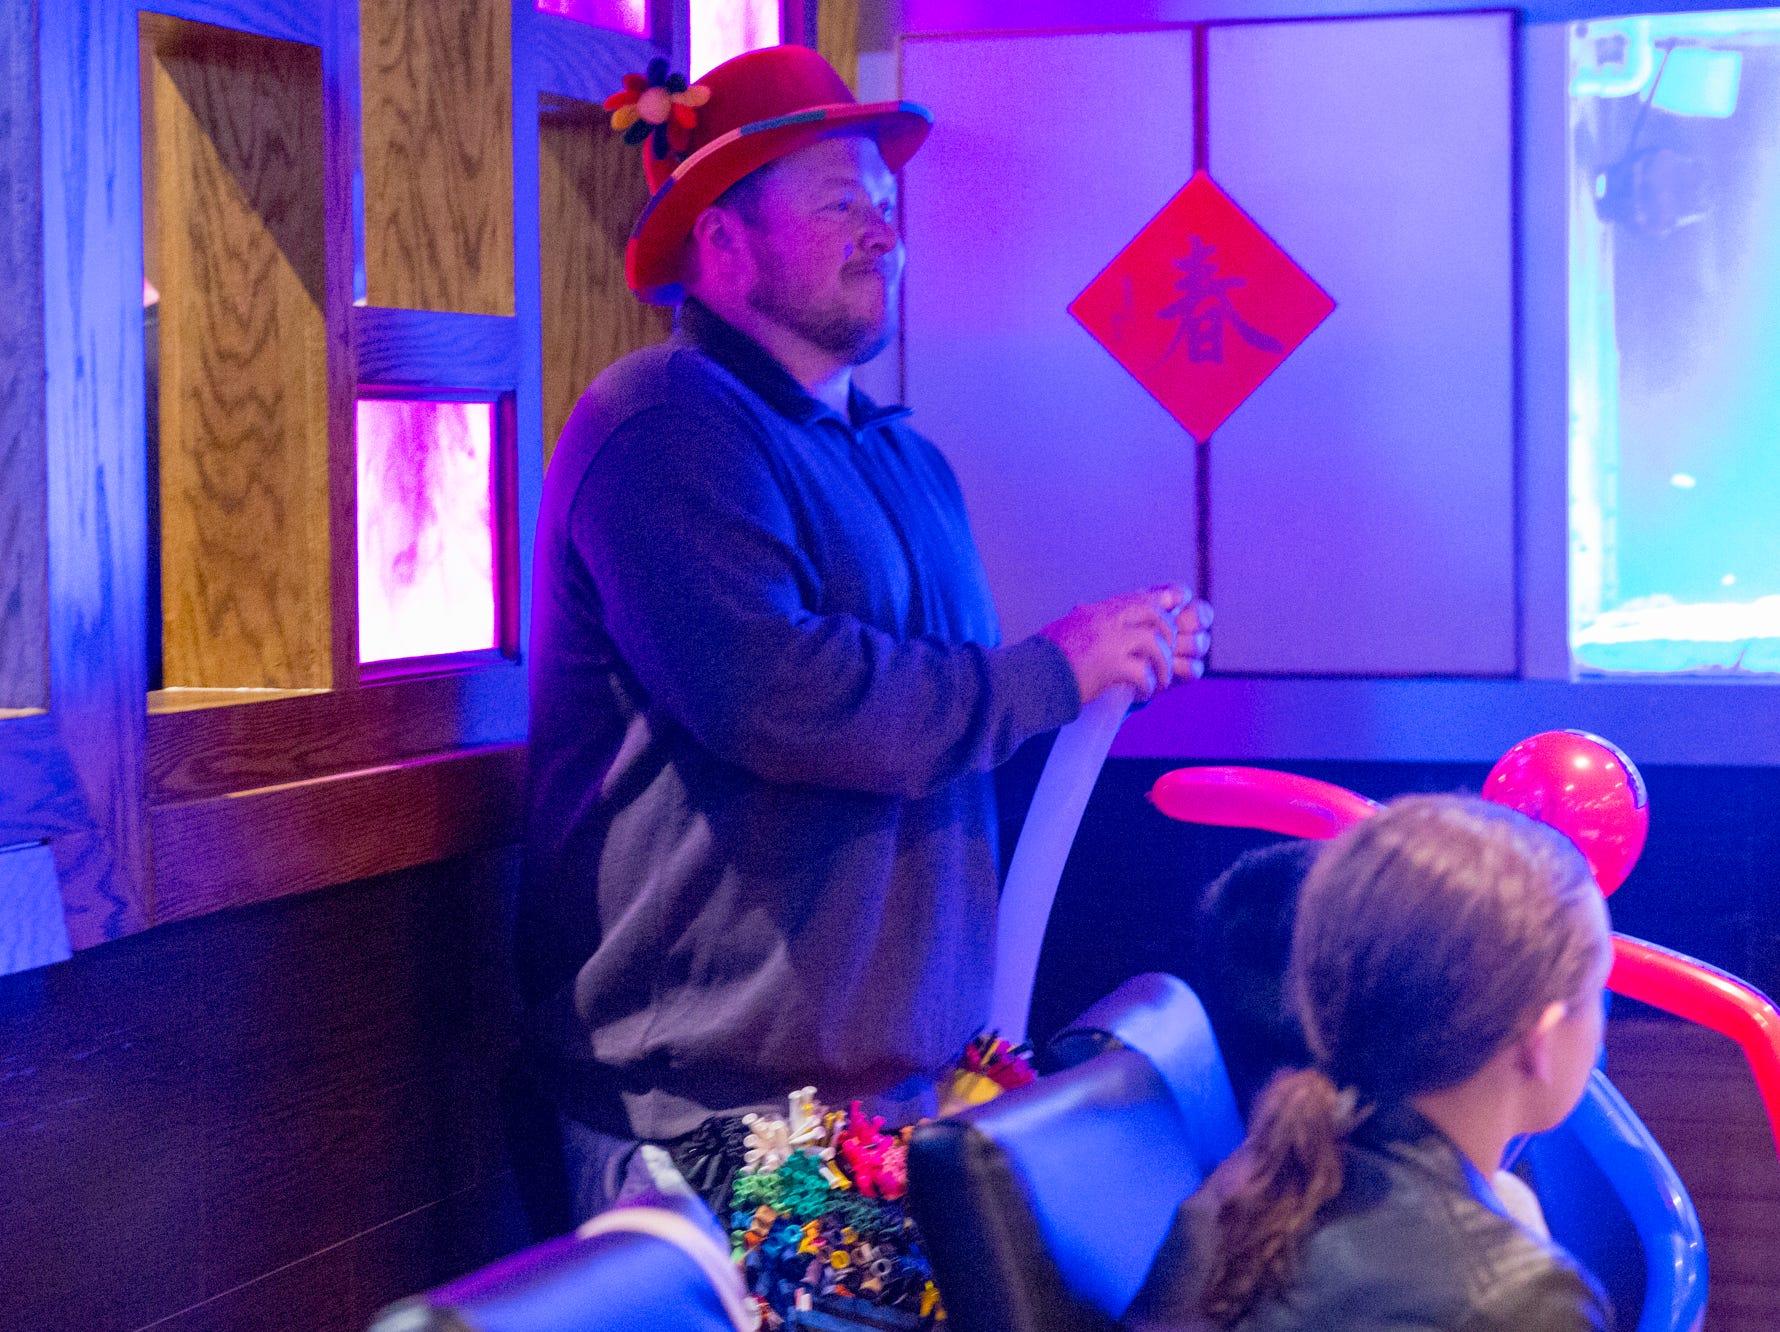 Terry Scott made ballon animals for the kids